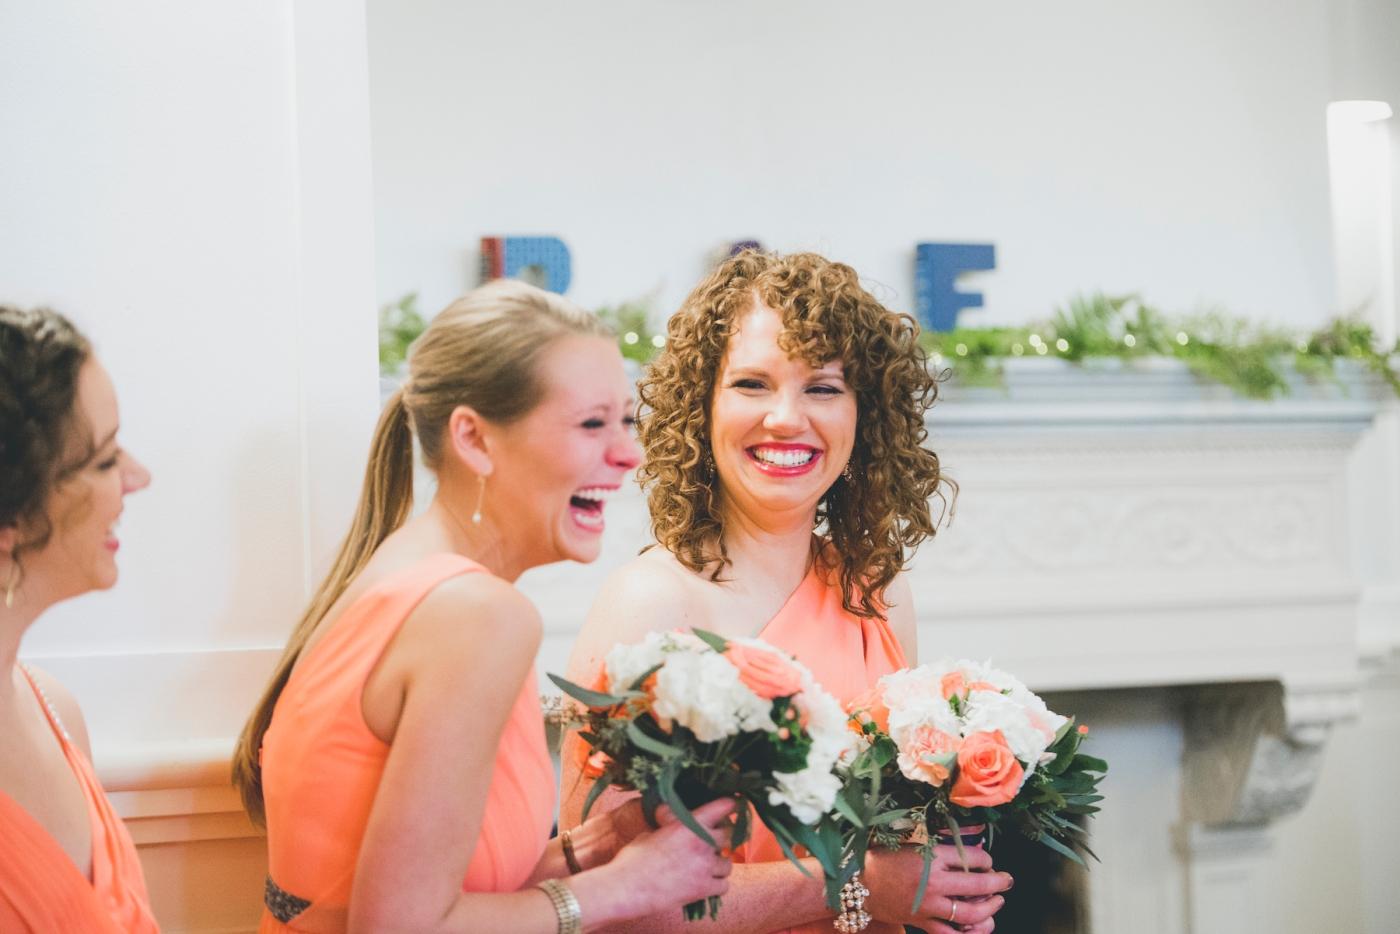 DSC_2691Everett_Wedding_Ballroom_Jane_Speleers_photography_Rachel_and_Edmund_Ceremony_2017